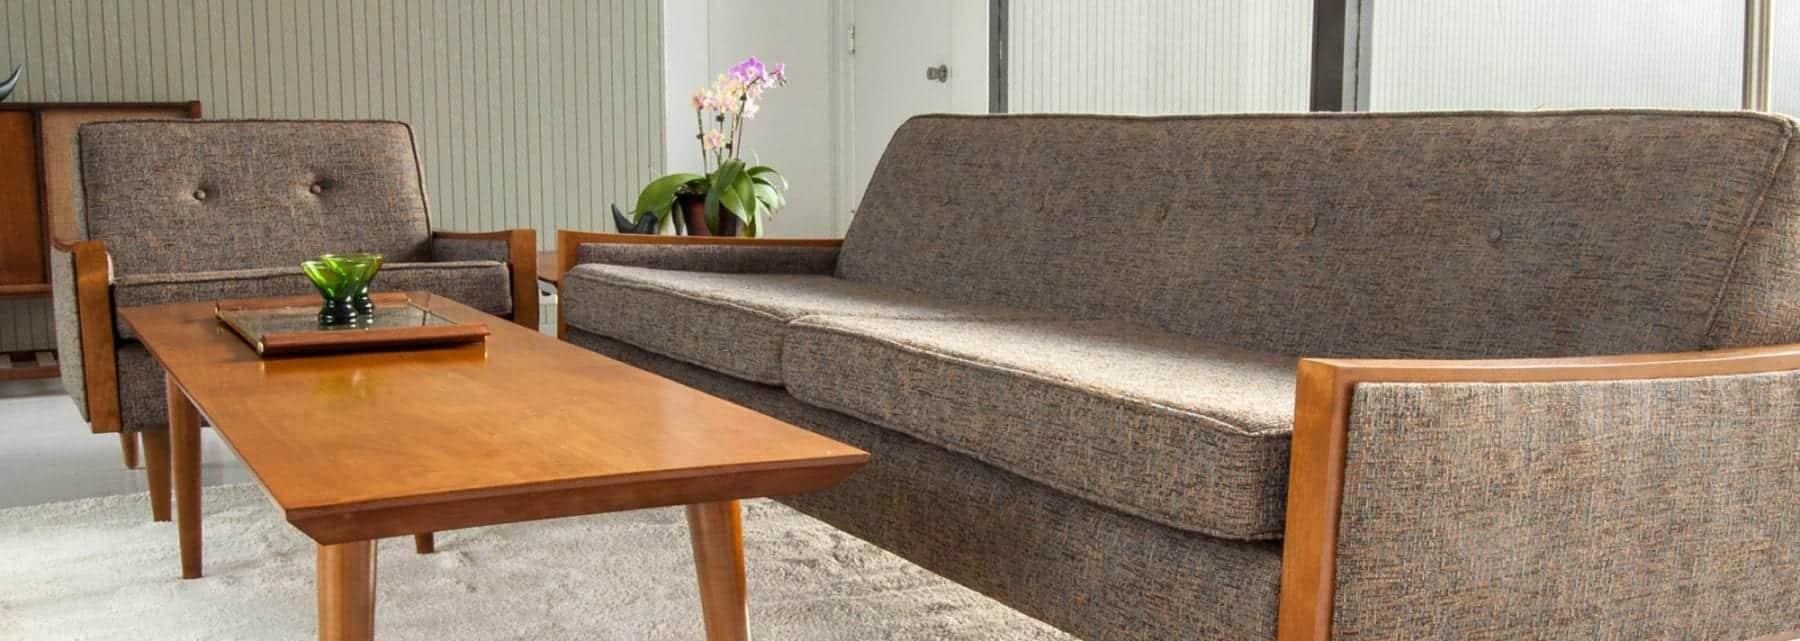 mad men style sofa